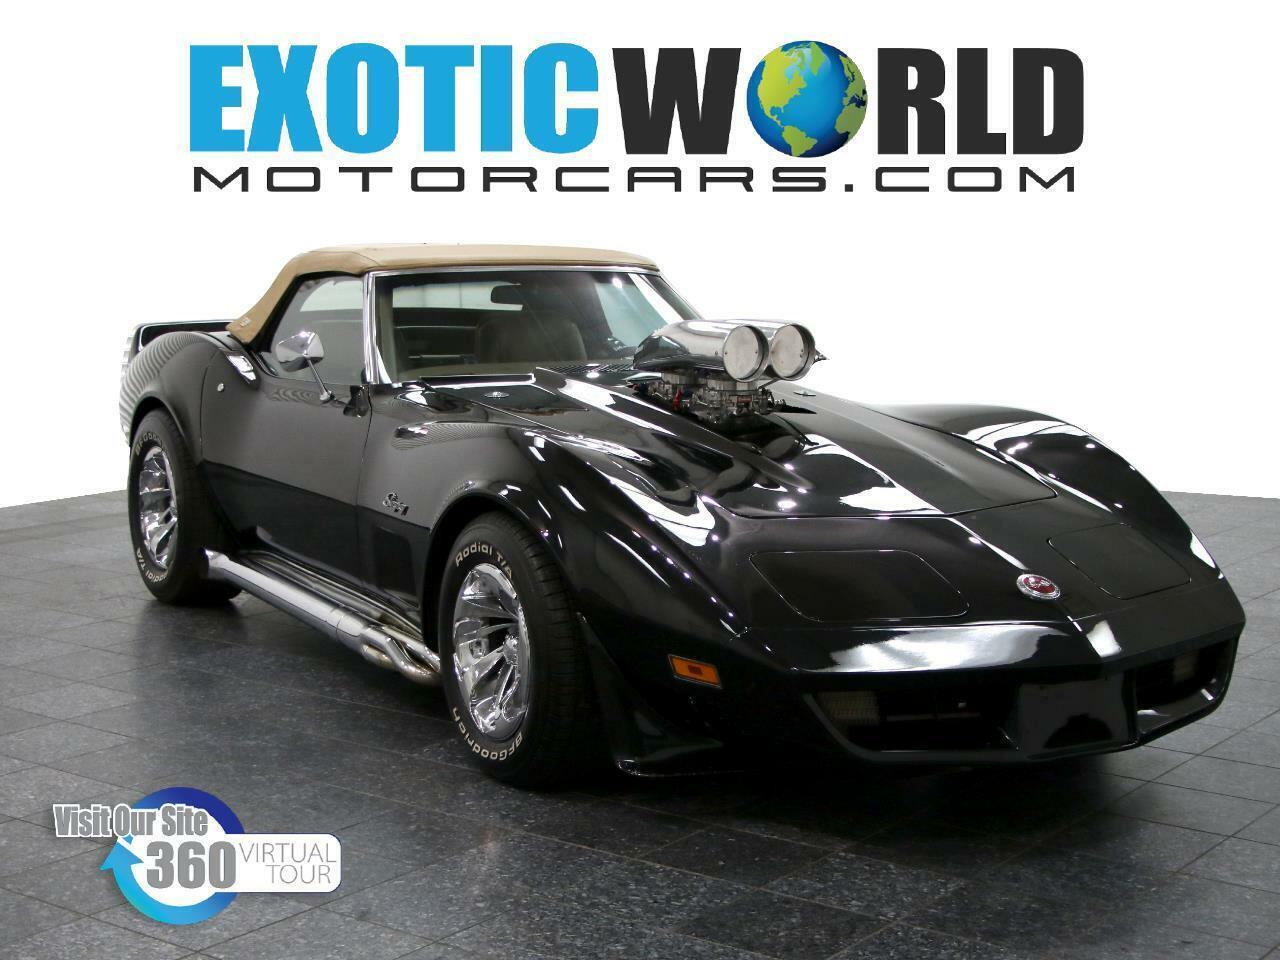 1974 Black Chevrolet Corvette   | C3 Corvette Photo 1